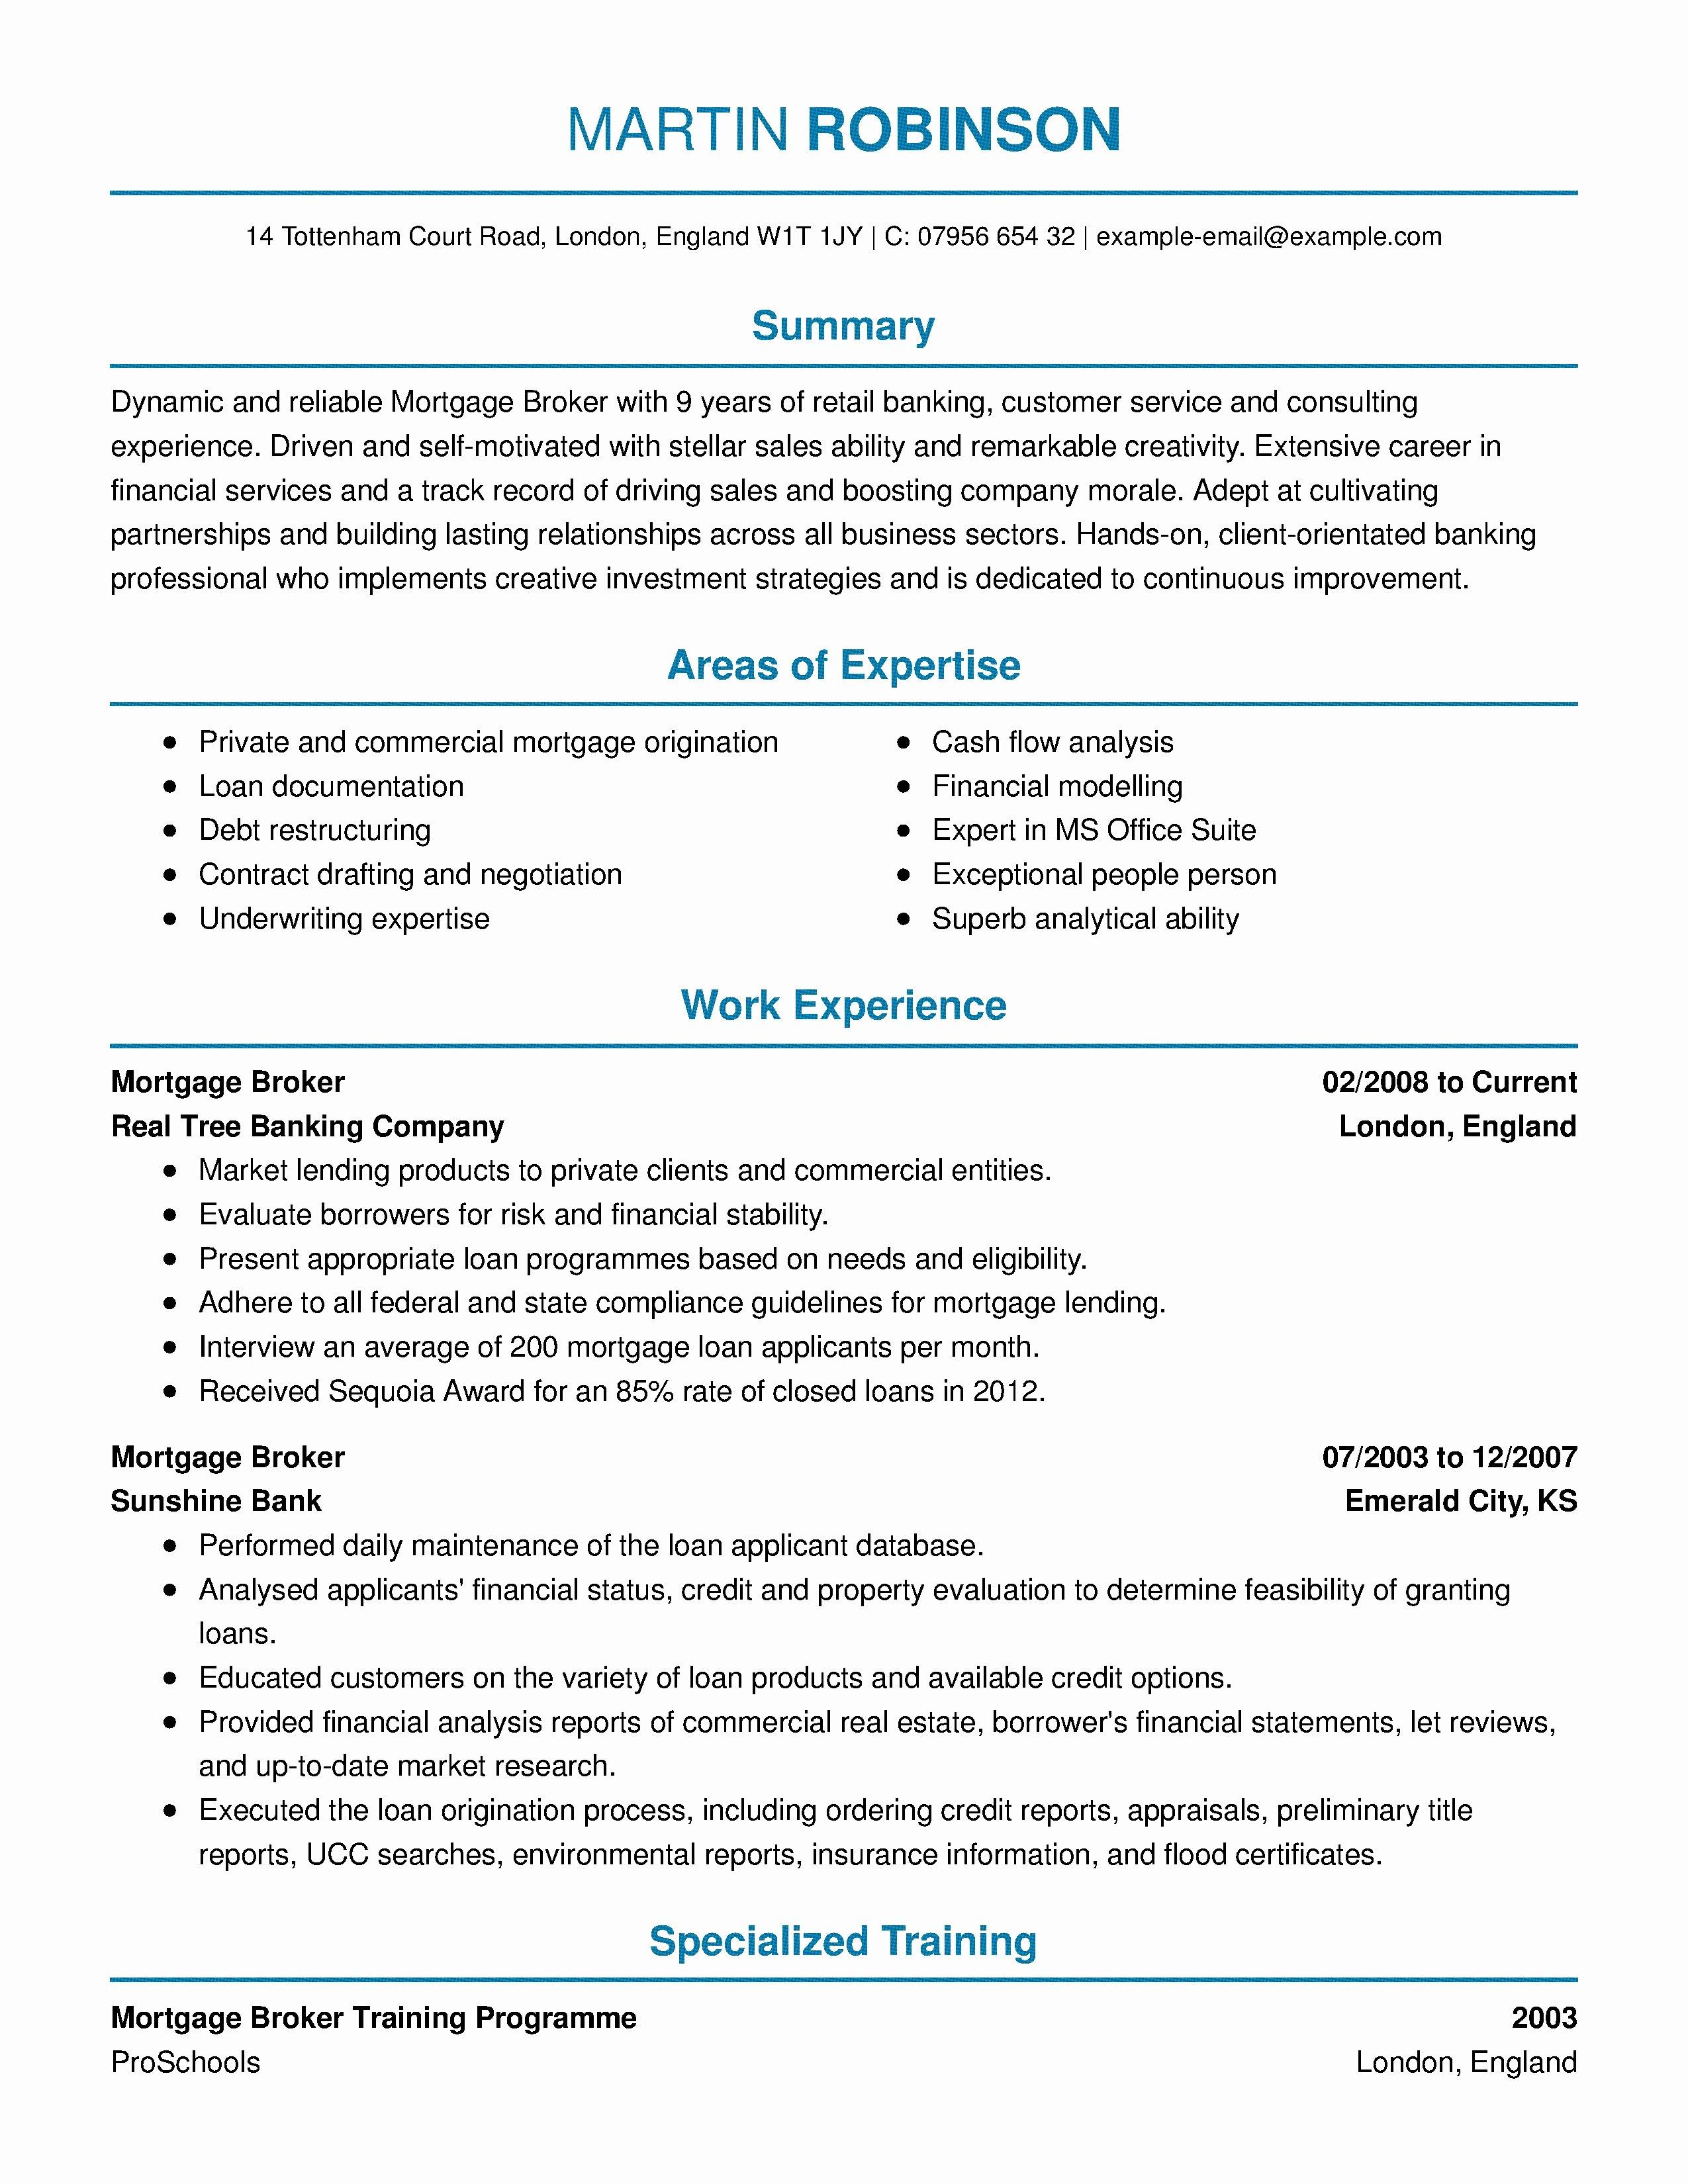 Business Valuation Report Template Worksheet – Guiaubuntupt In Business Valuation Report Template Worksheet